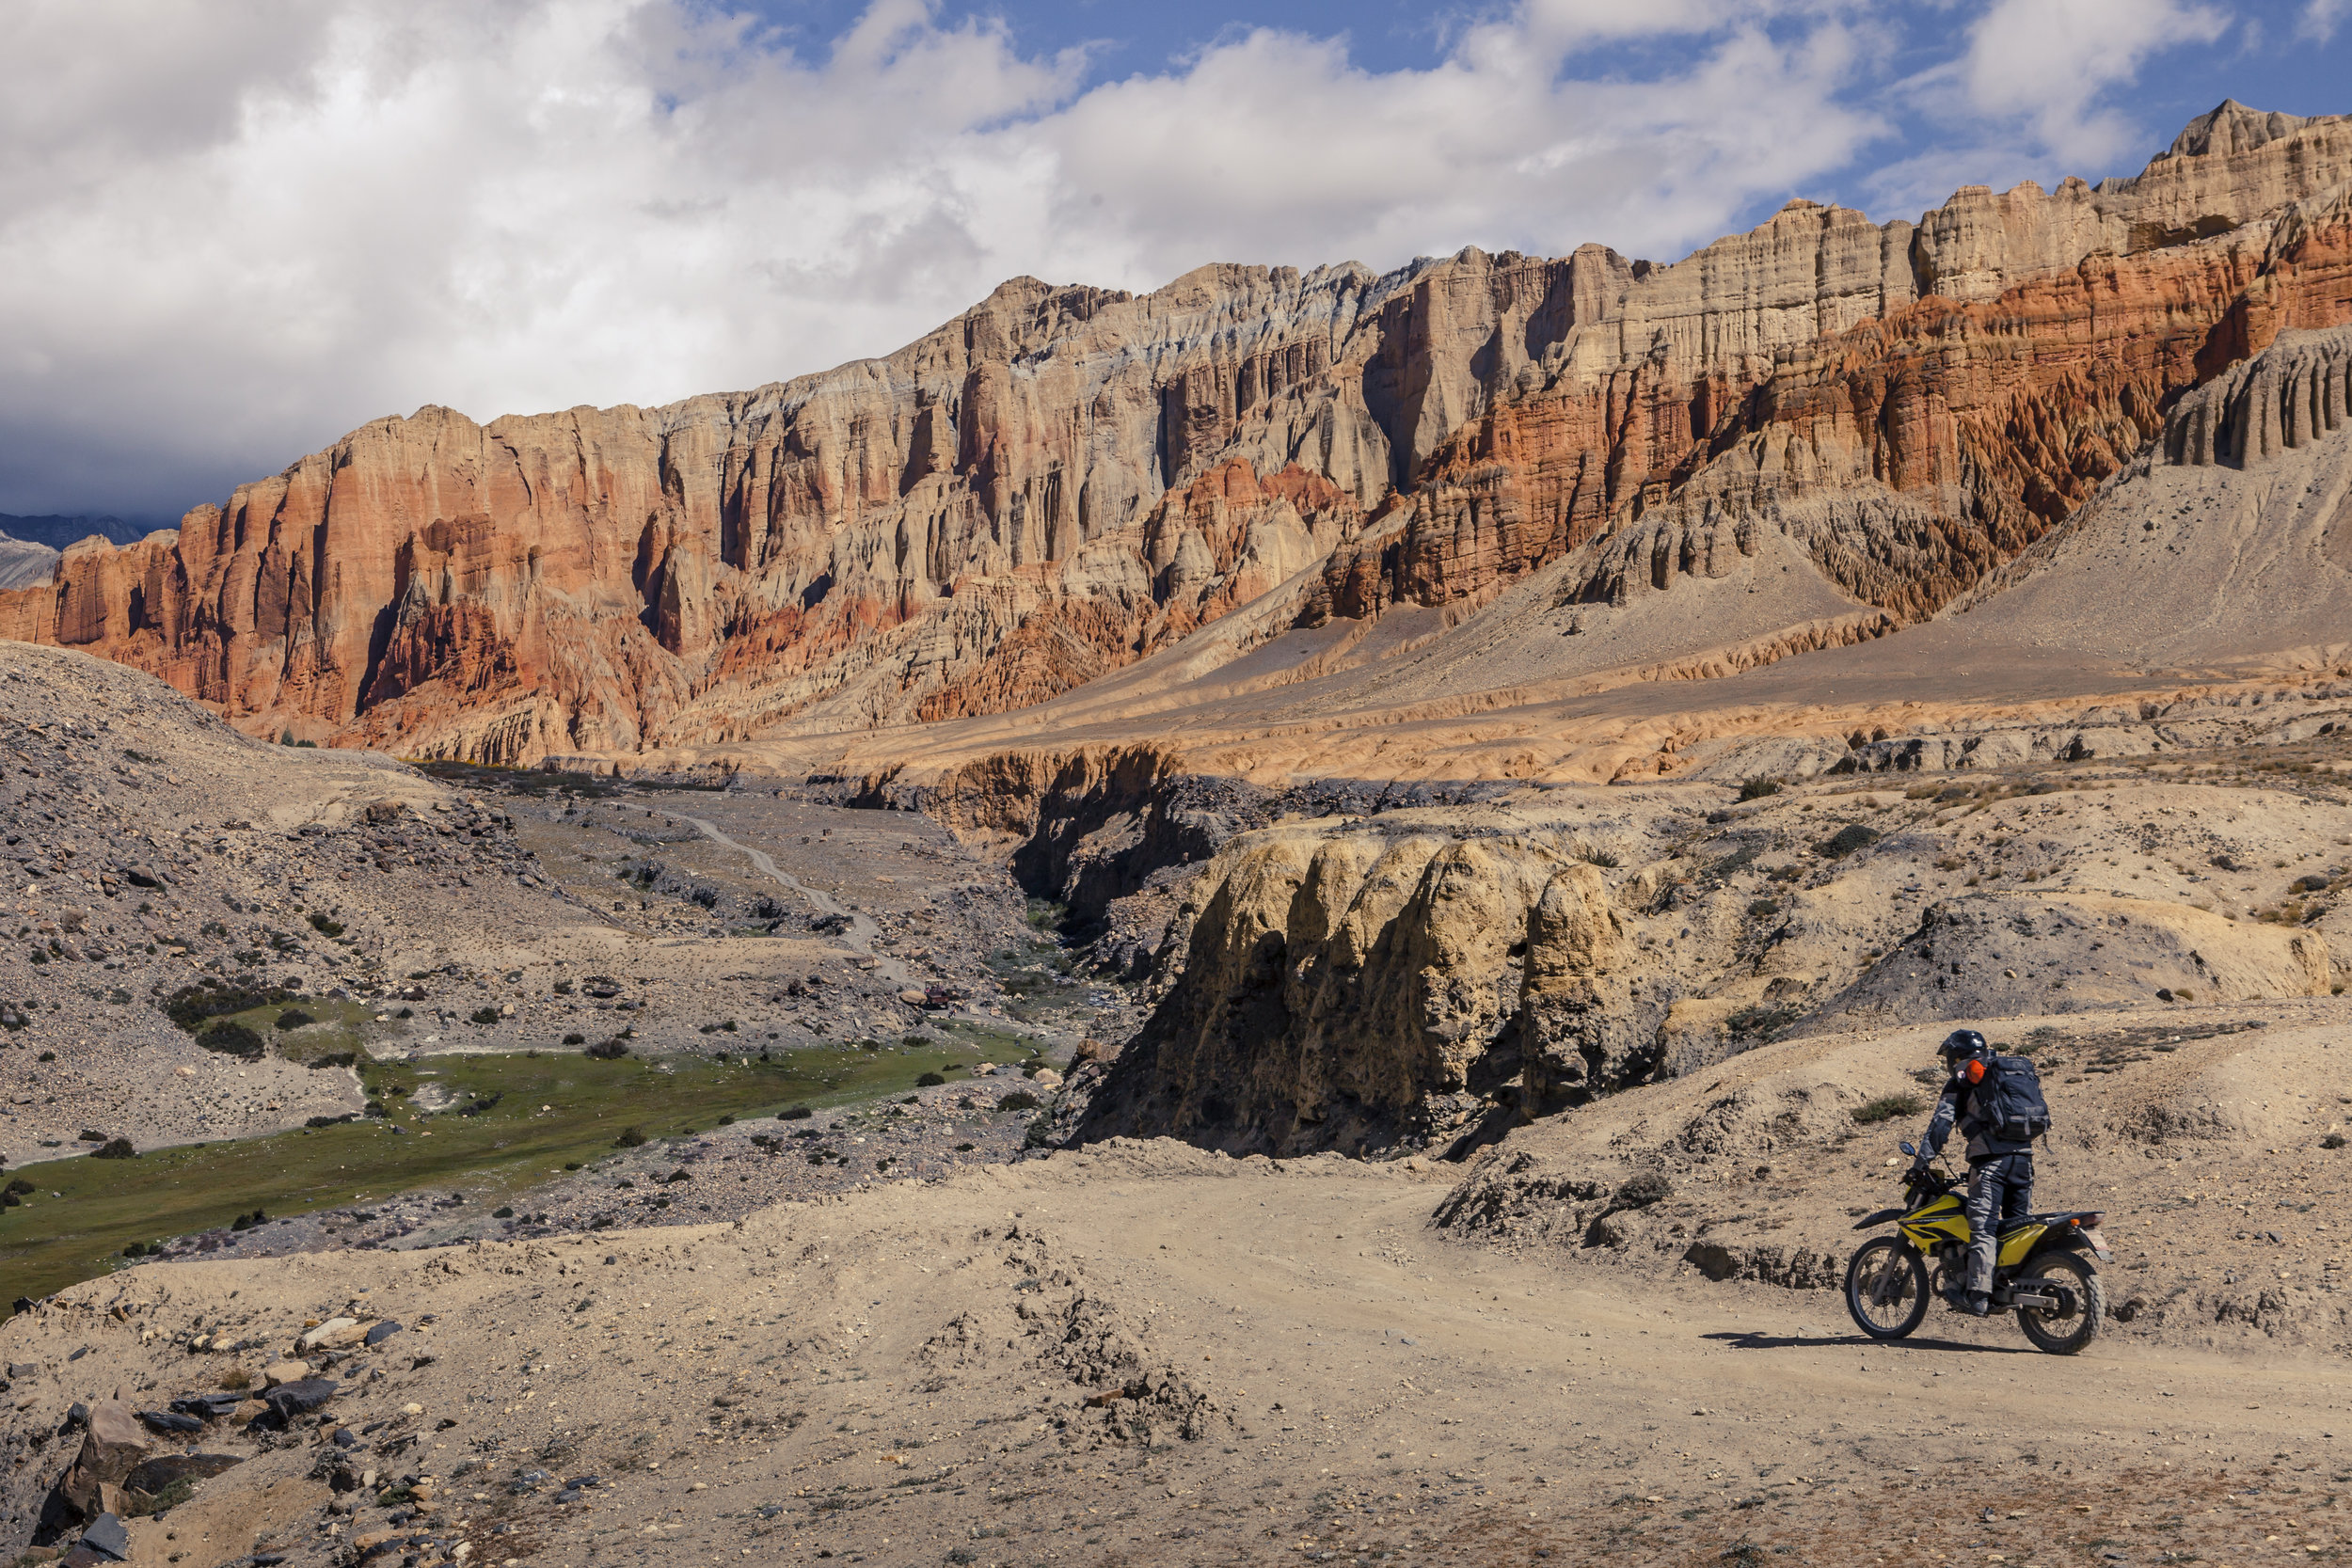 TWHMC-nepal-motorcycle-adventure-2016-1066.jpg